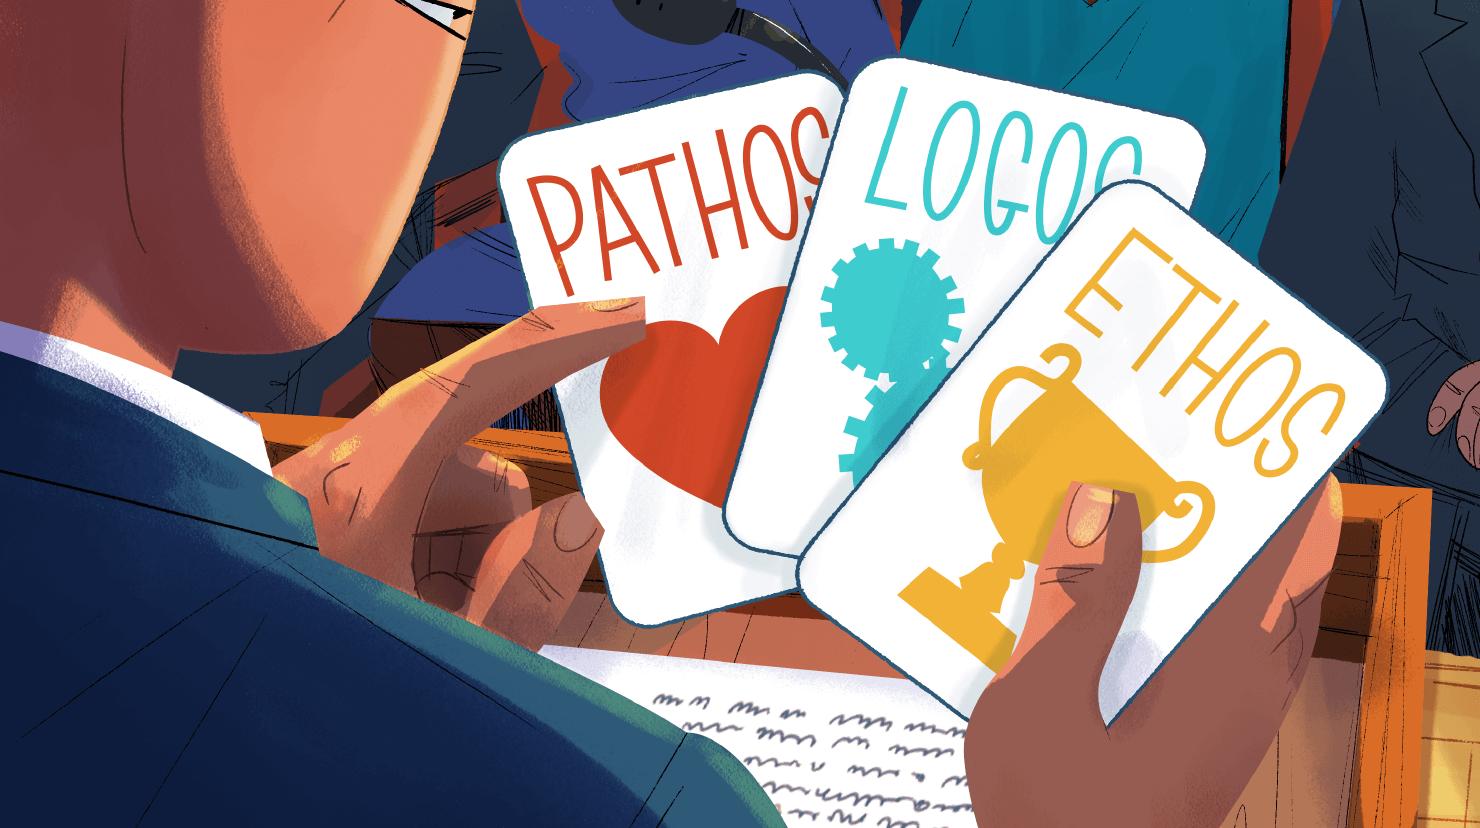 Cartoon male holding pathos, logos and ethos cards